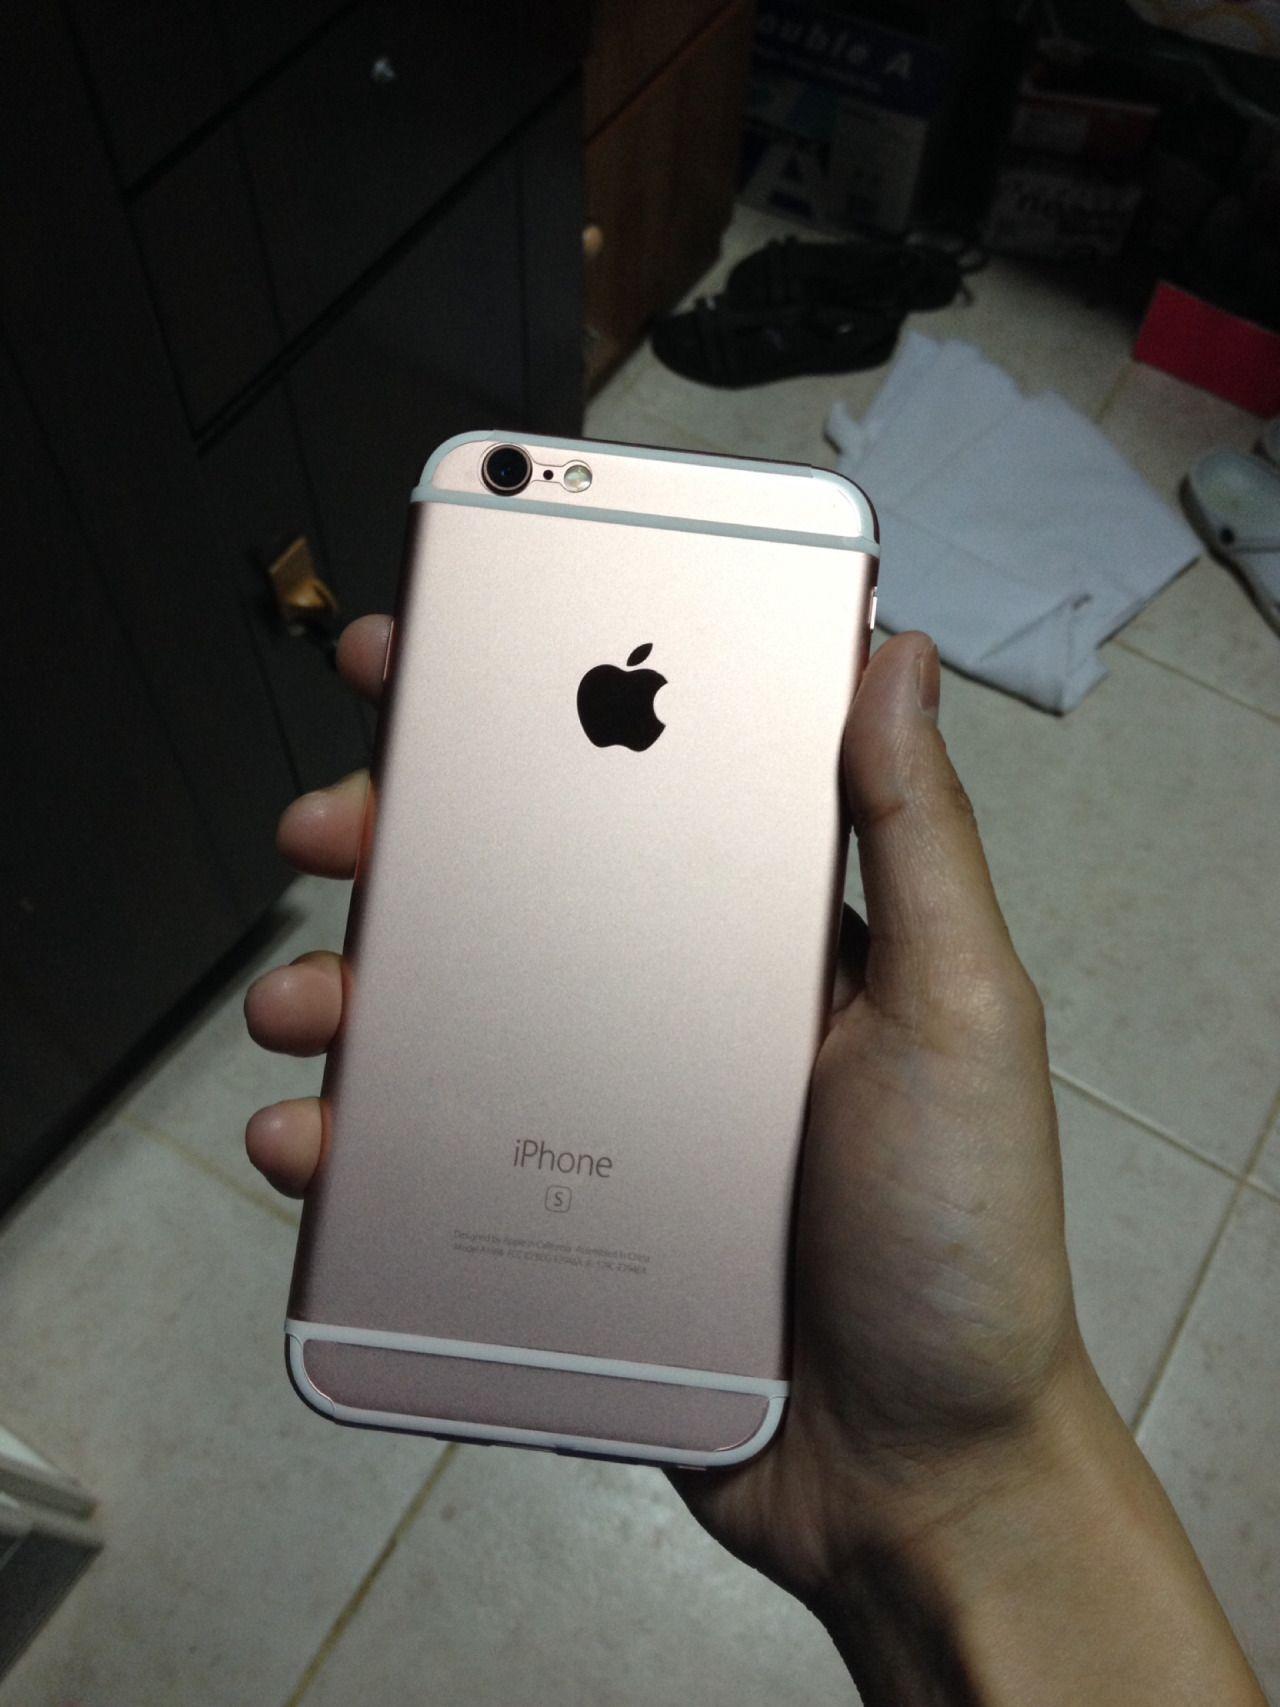 iPhone 6s | Tumblr | Iphone, Apple iphone accessories, Apple ...